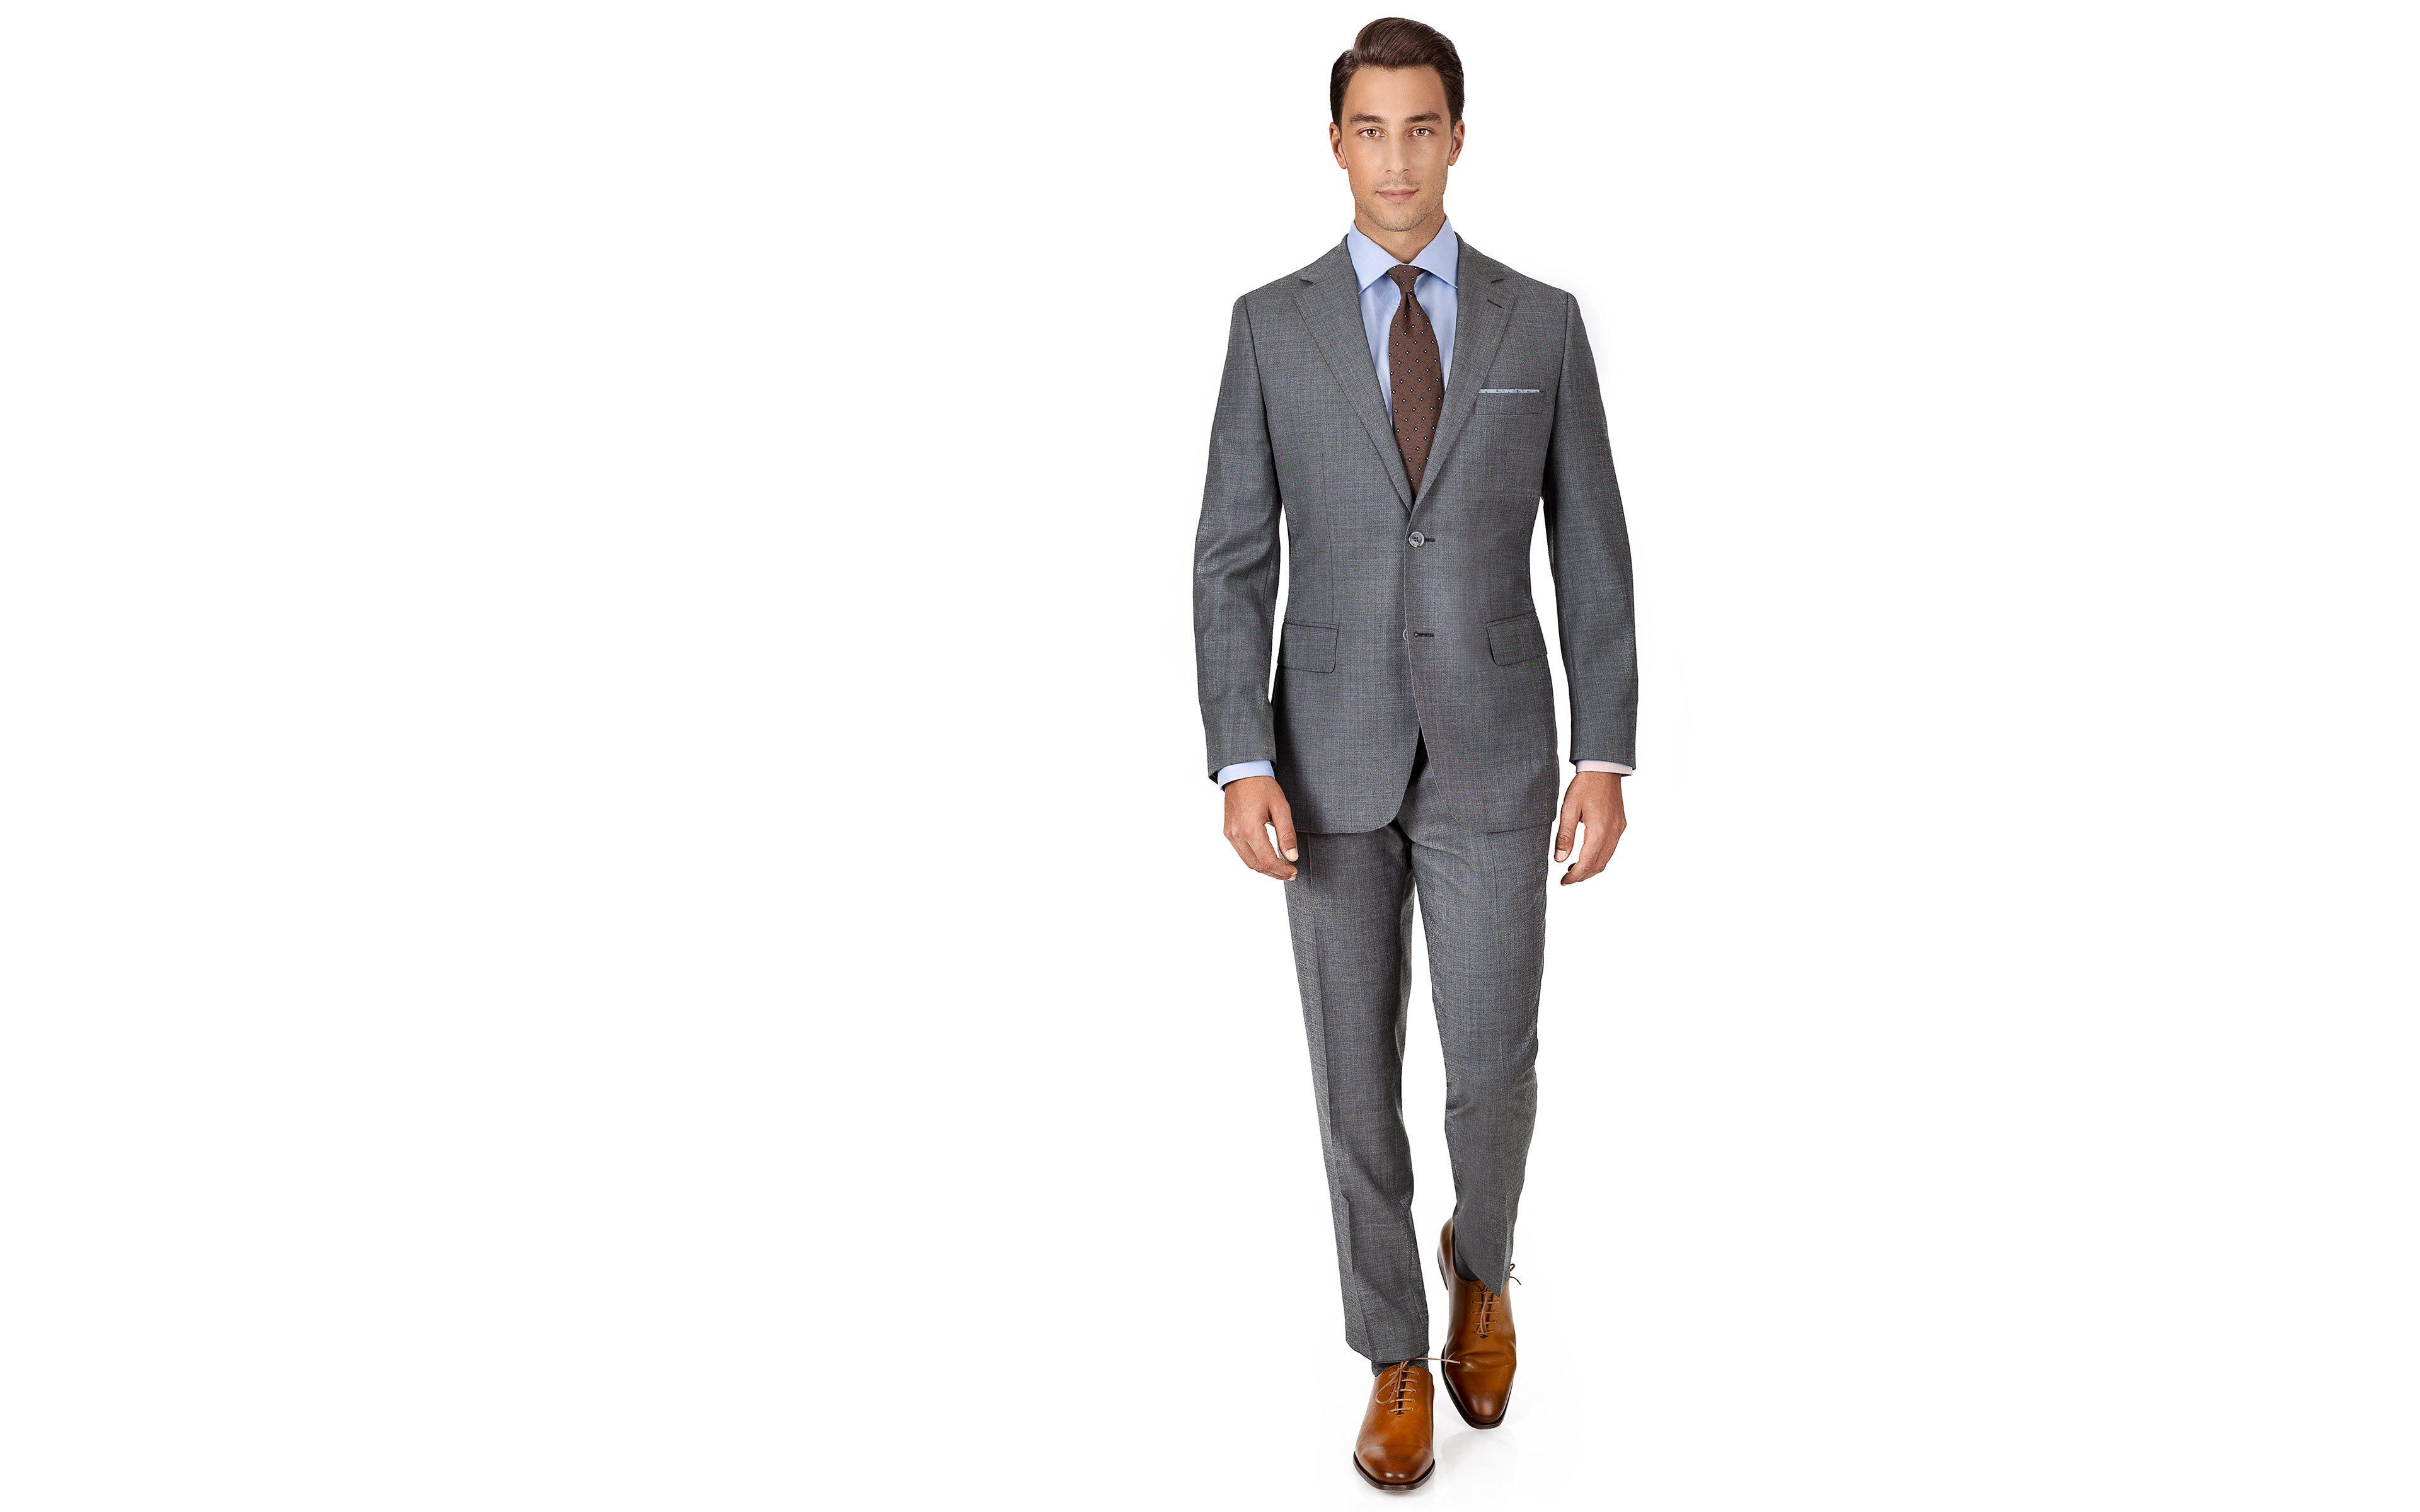 Suit in Grey Pick & Pick Wool